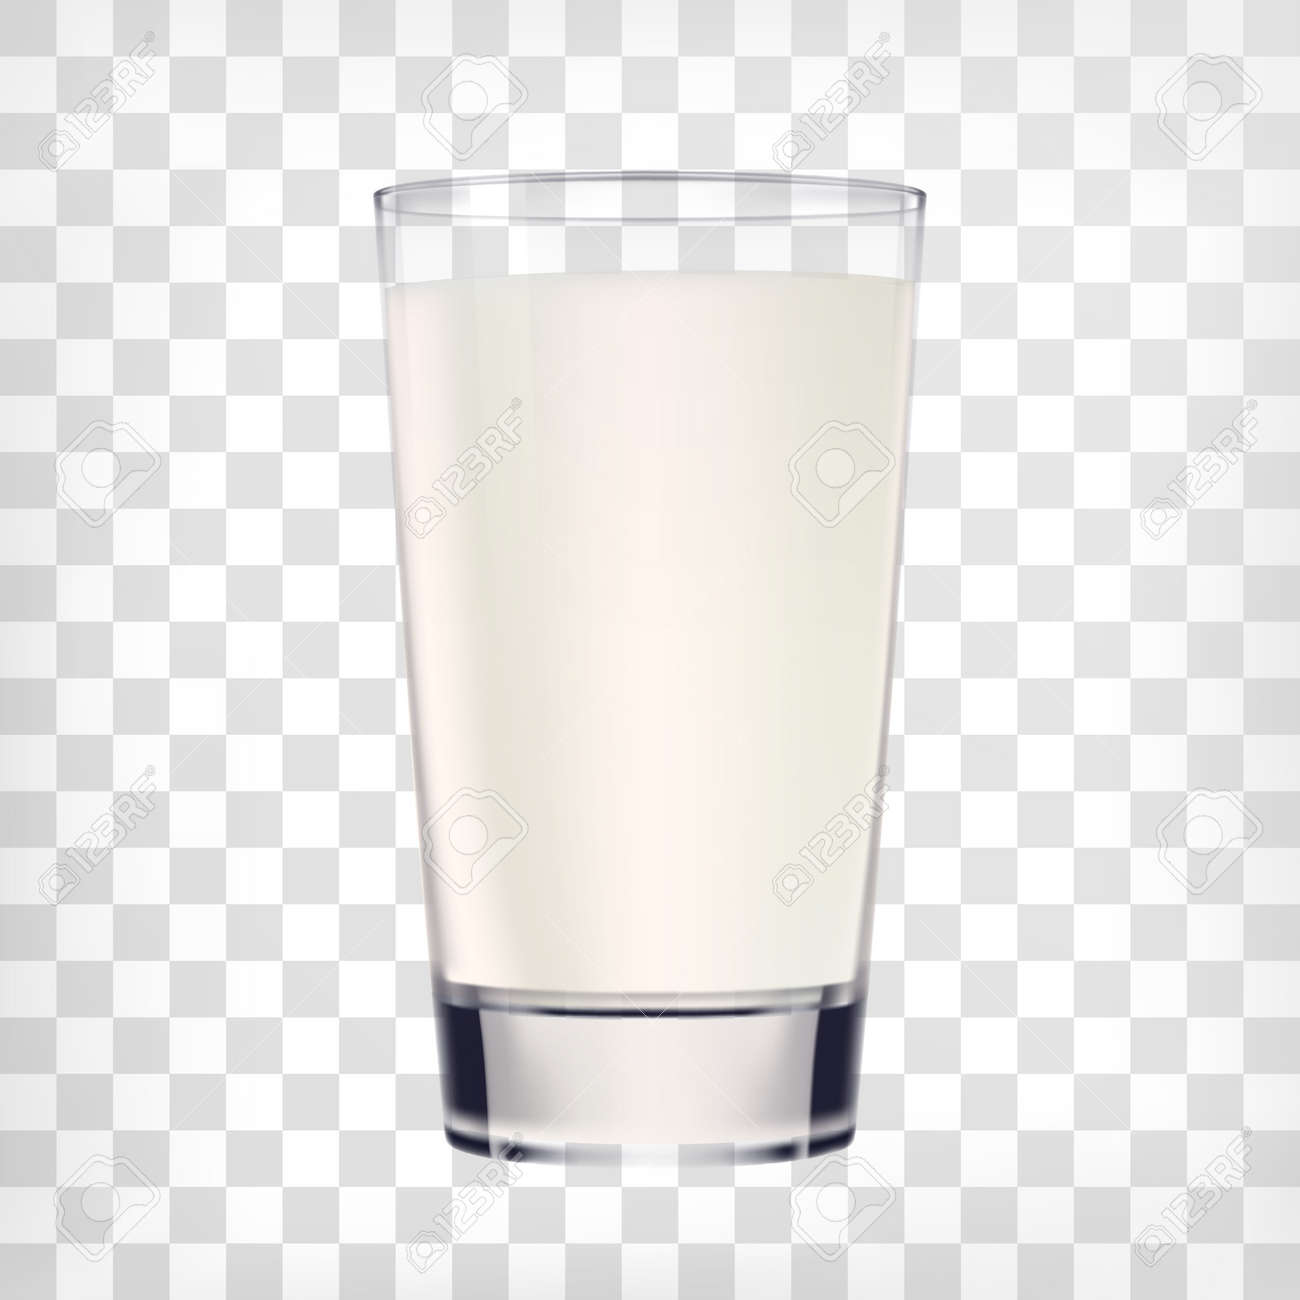 Milk glass on transparent background. Vector glass cup of milk illustration - 63134807